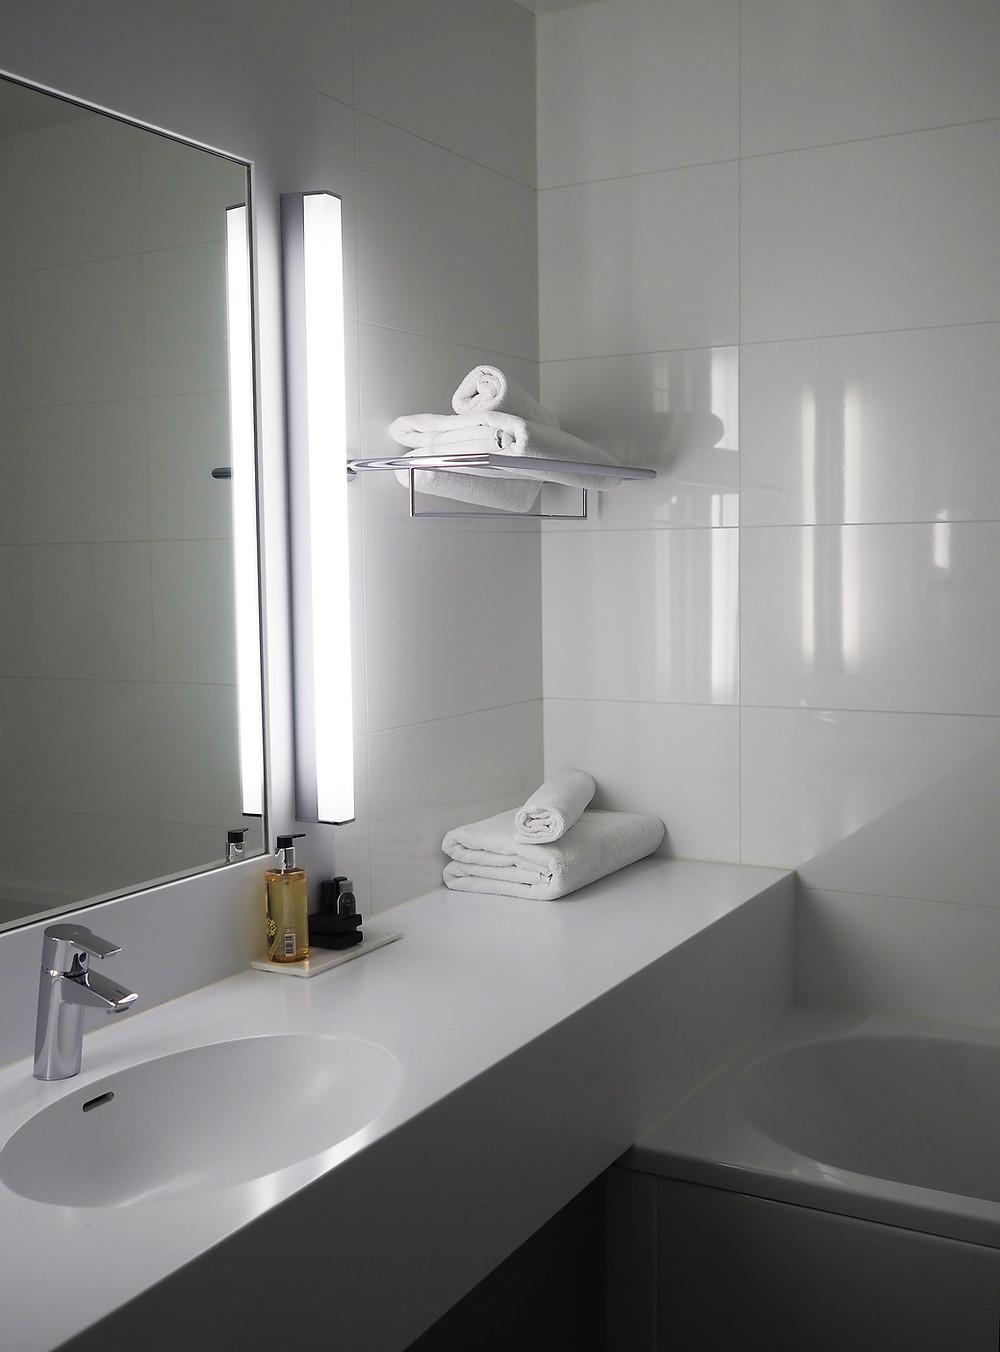 Solo Sokos Hotel Paviljonki kylpyhuone